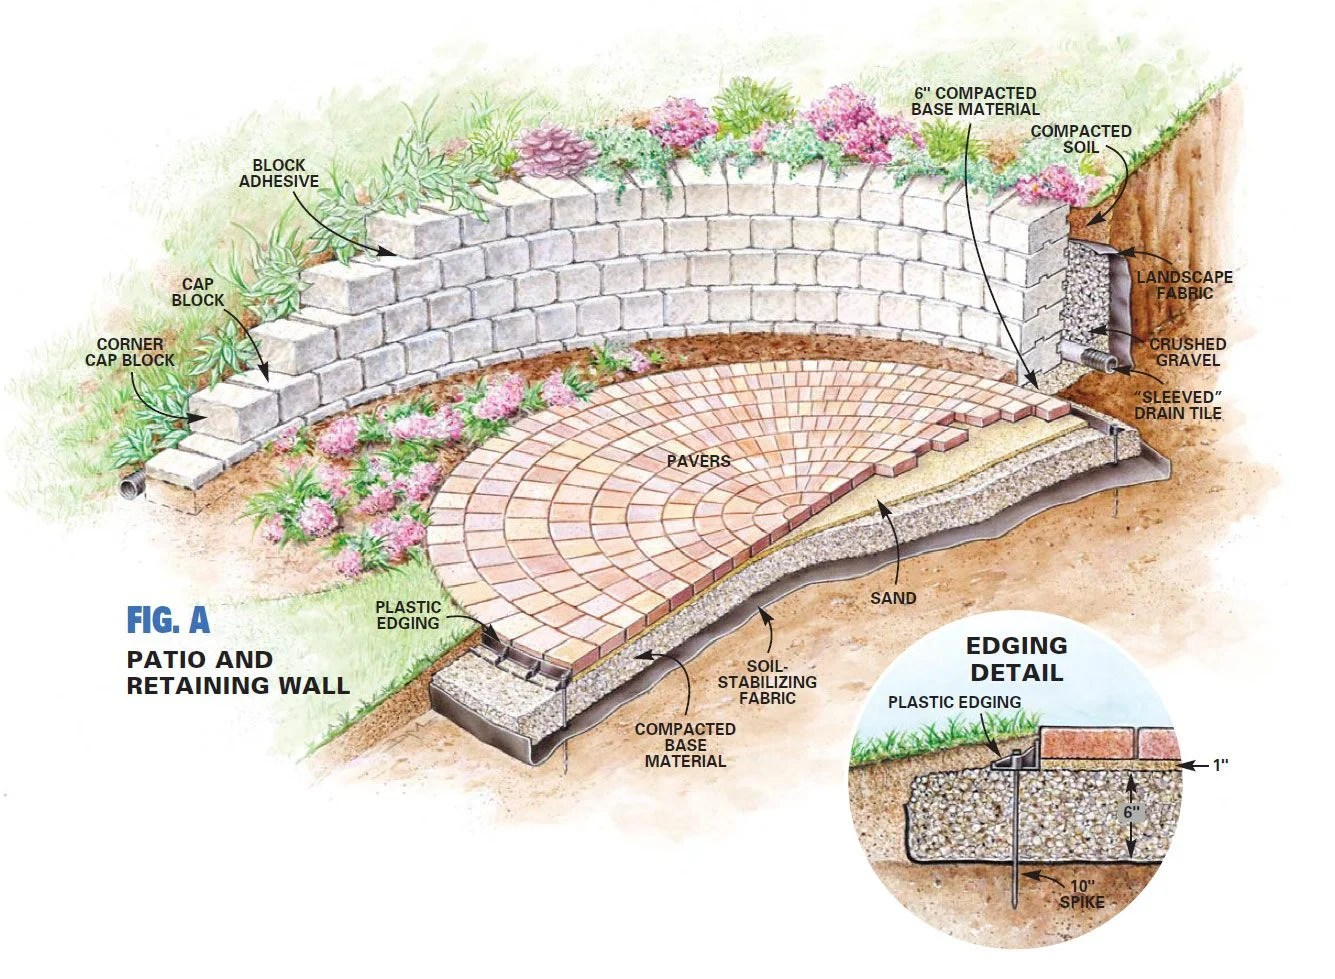 build a circular patio and retaining